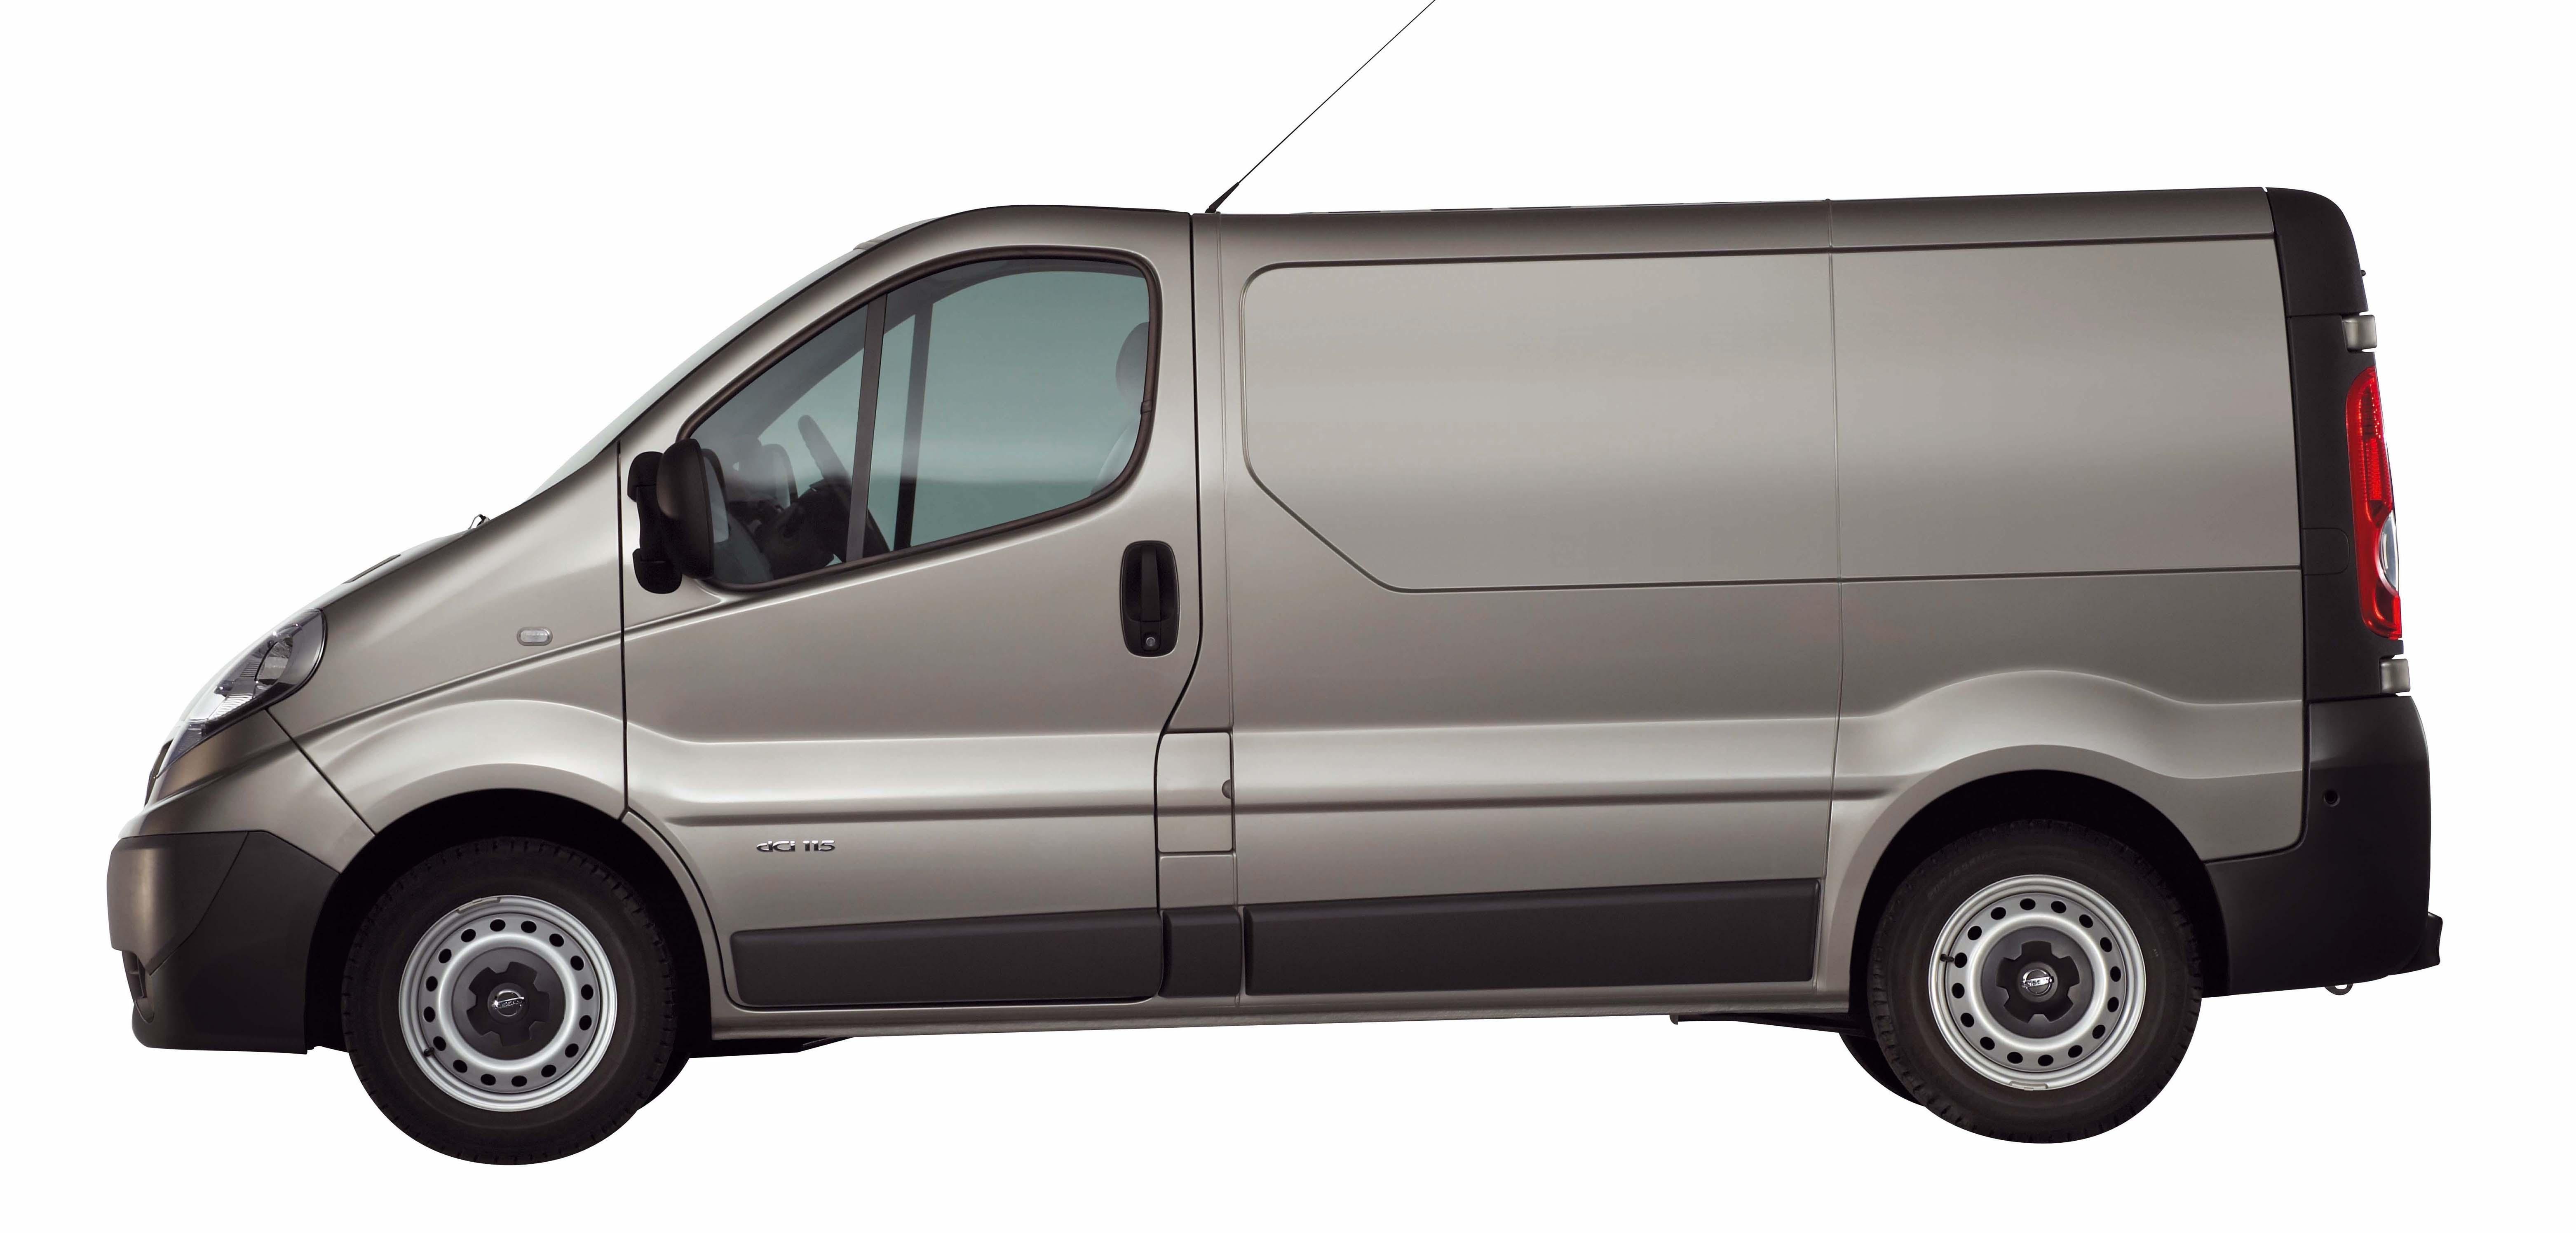 Nissan Primastar Semper Fidelis Image 11